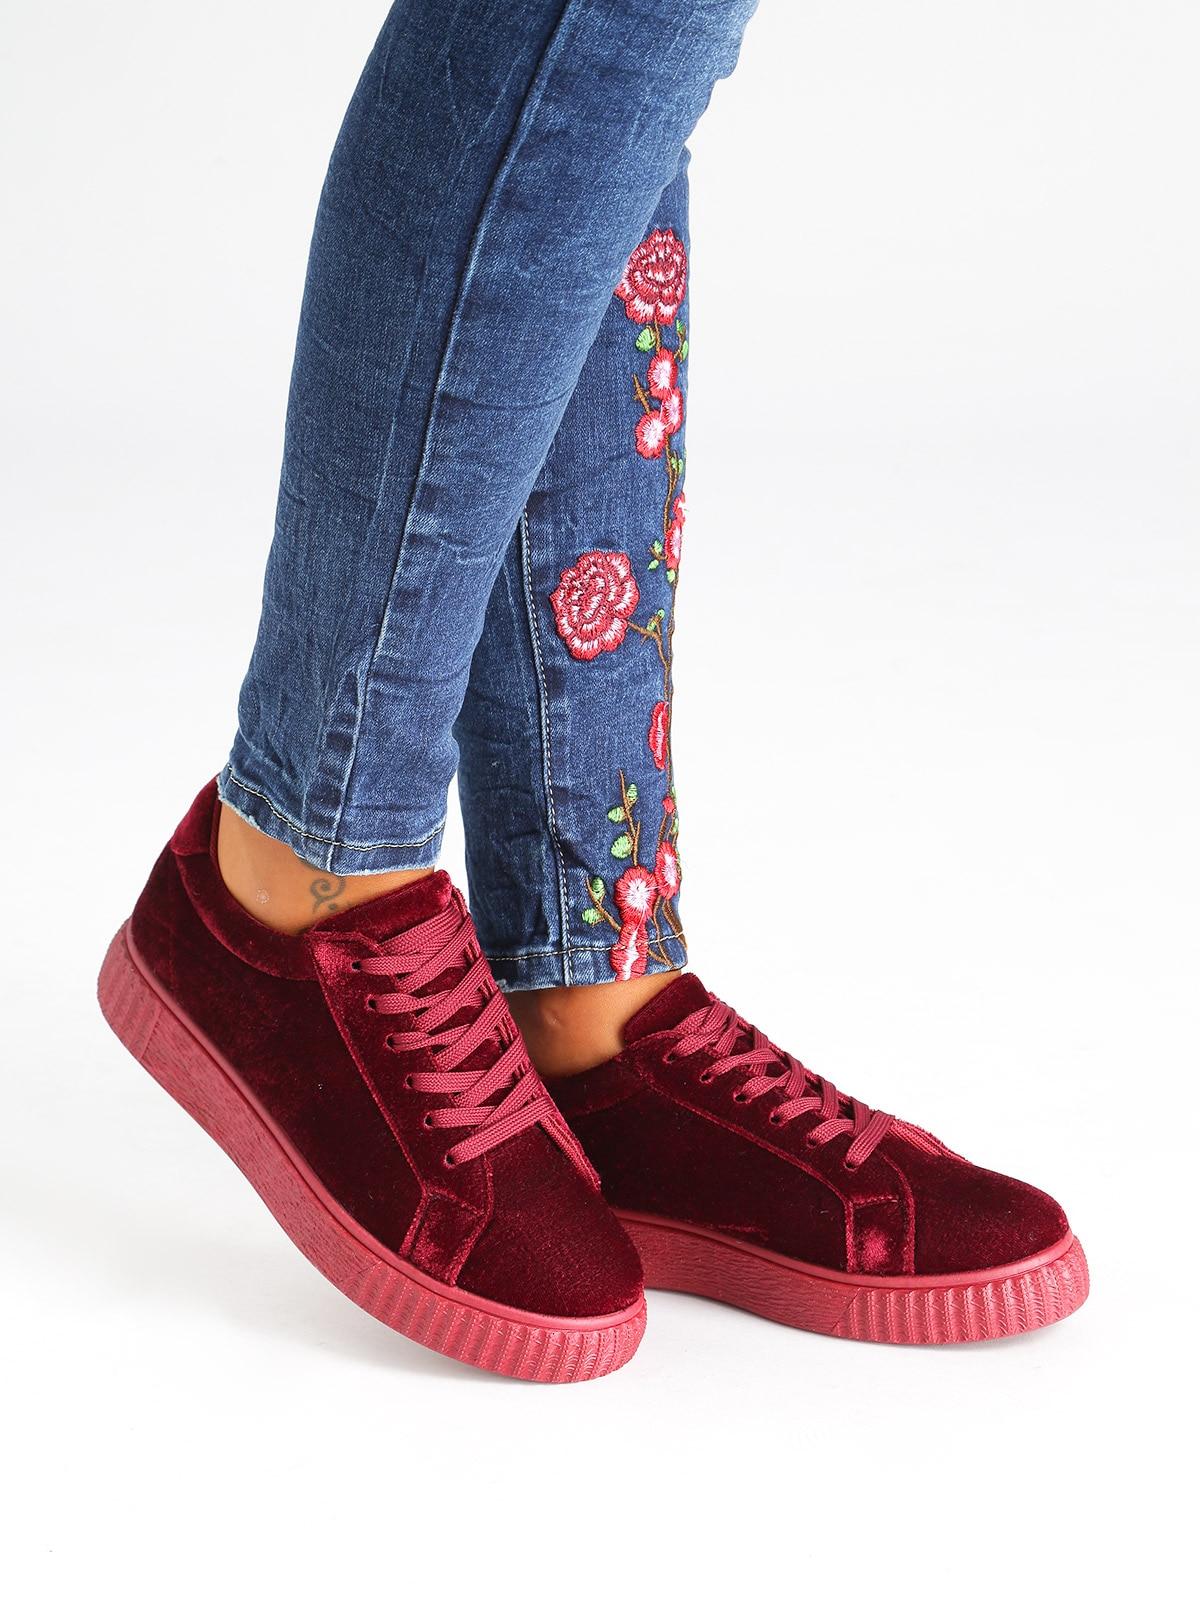 OMS Low Sneakers Velvet Effect